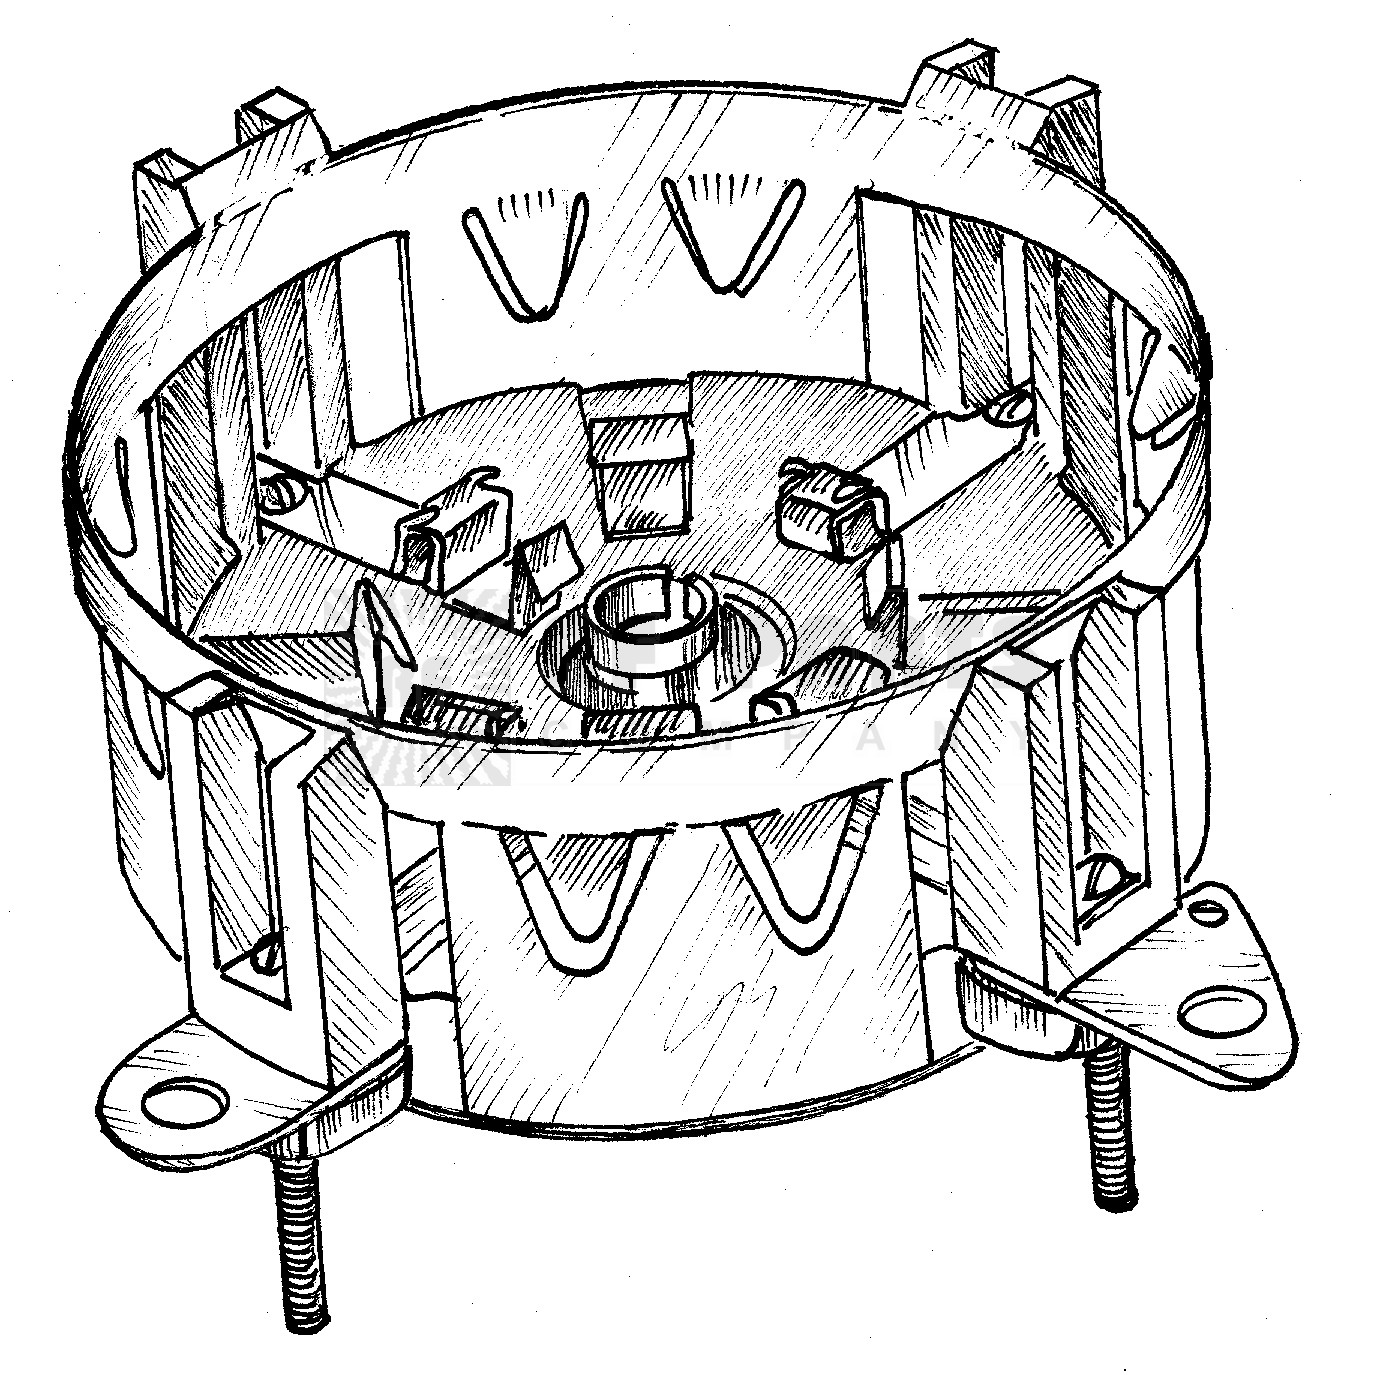 SK3A Tube socket, 4cx1600b